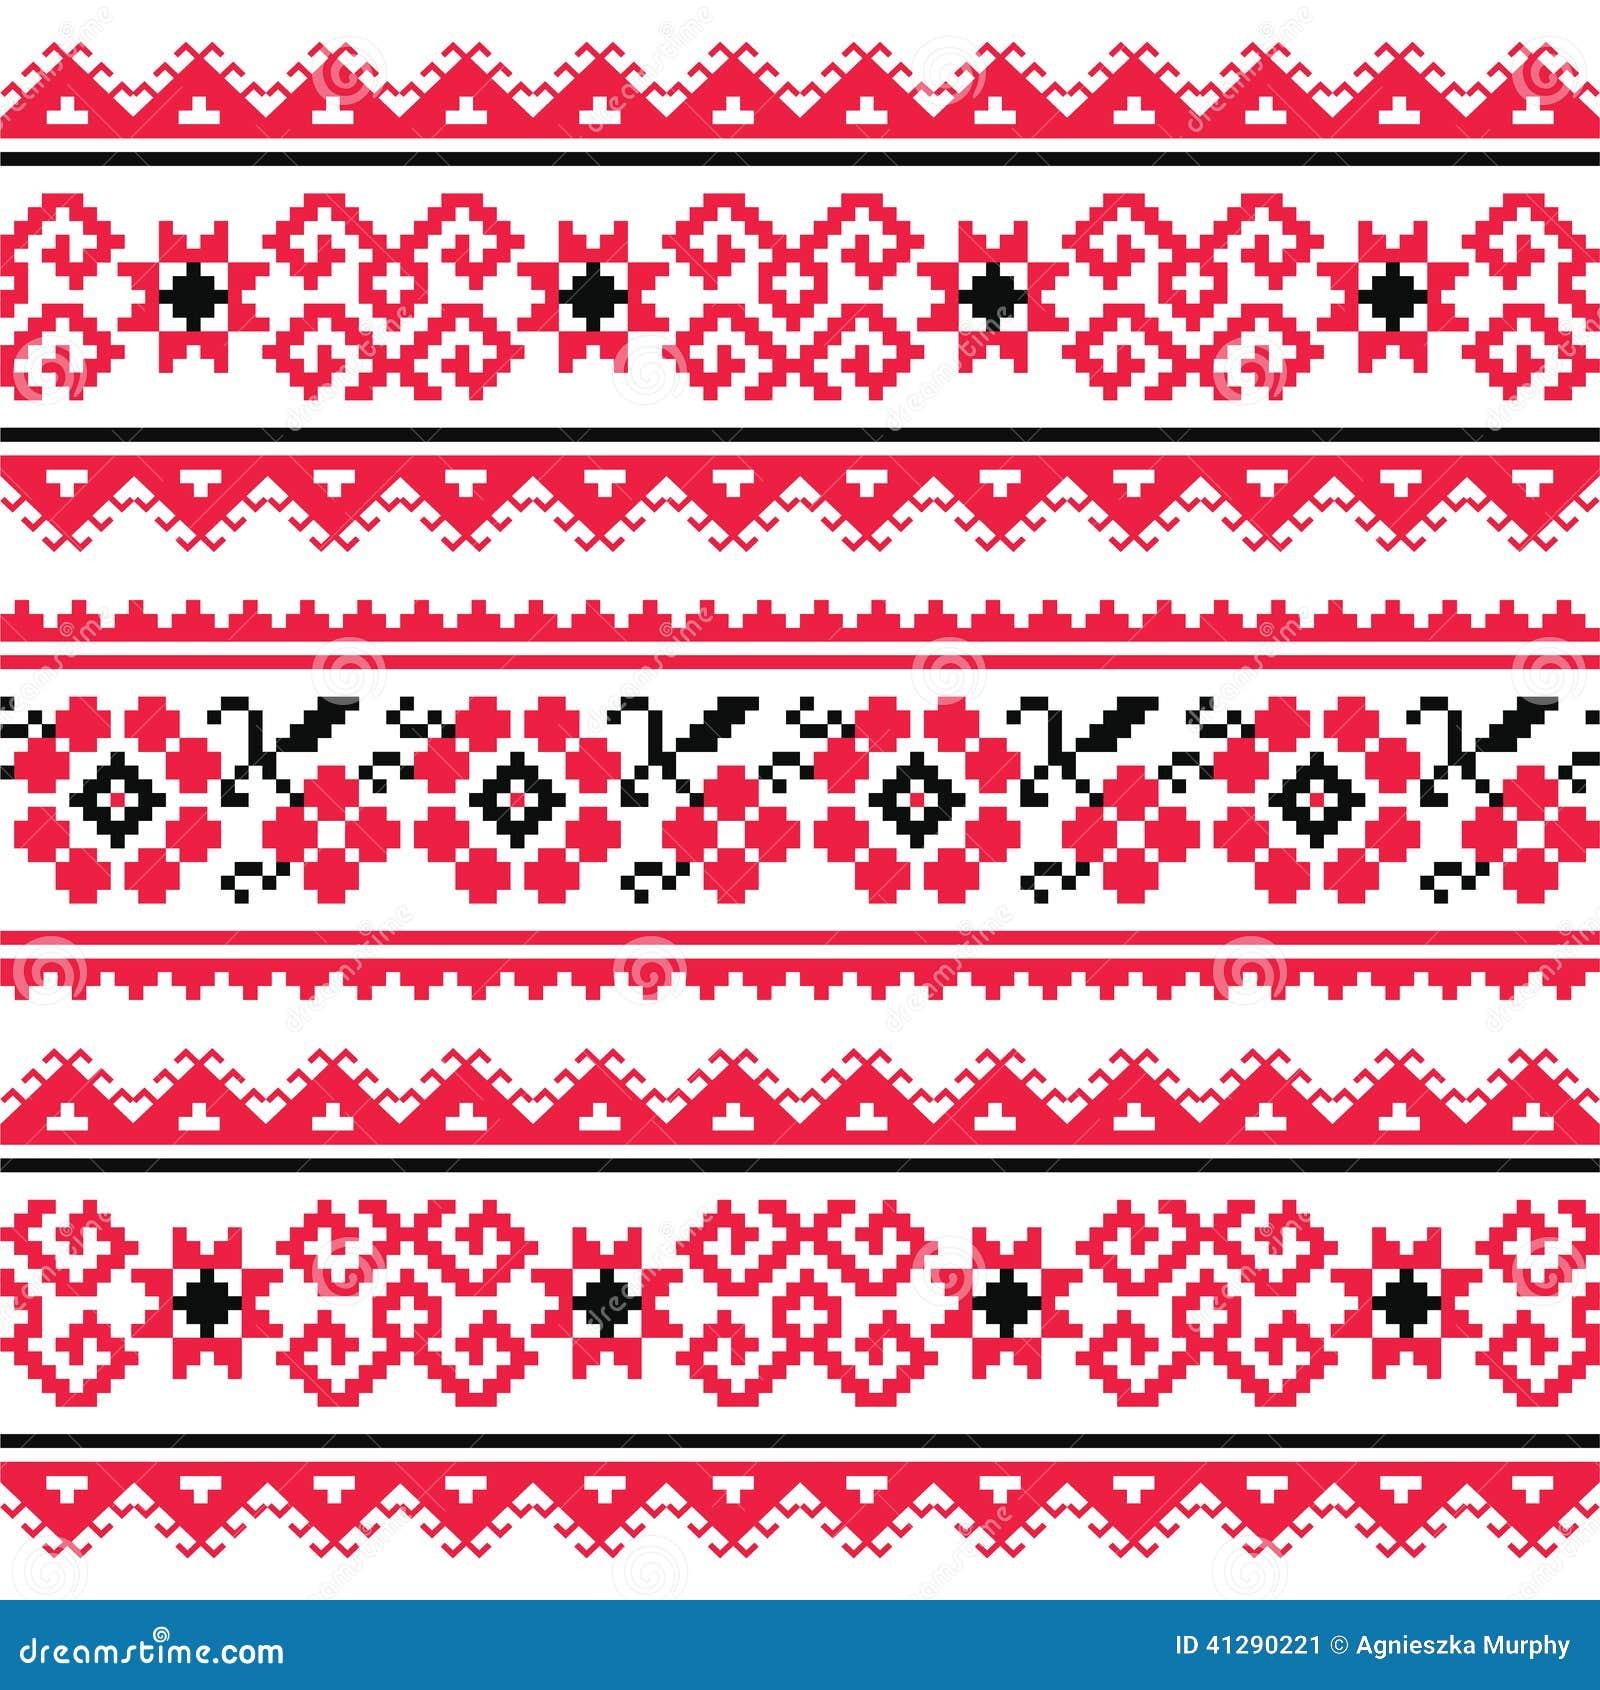 Ukrainian folk art embroidery pattern or print stock image